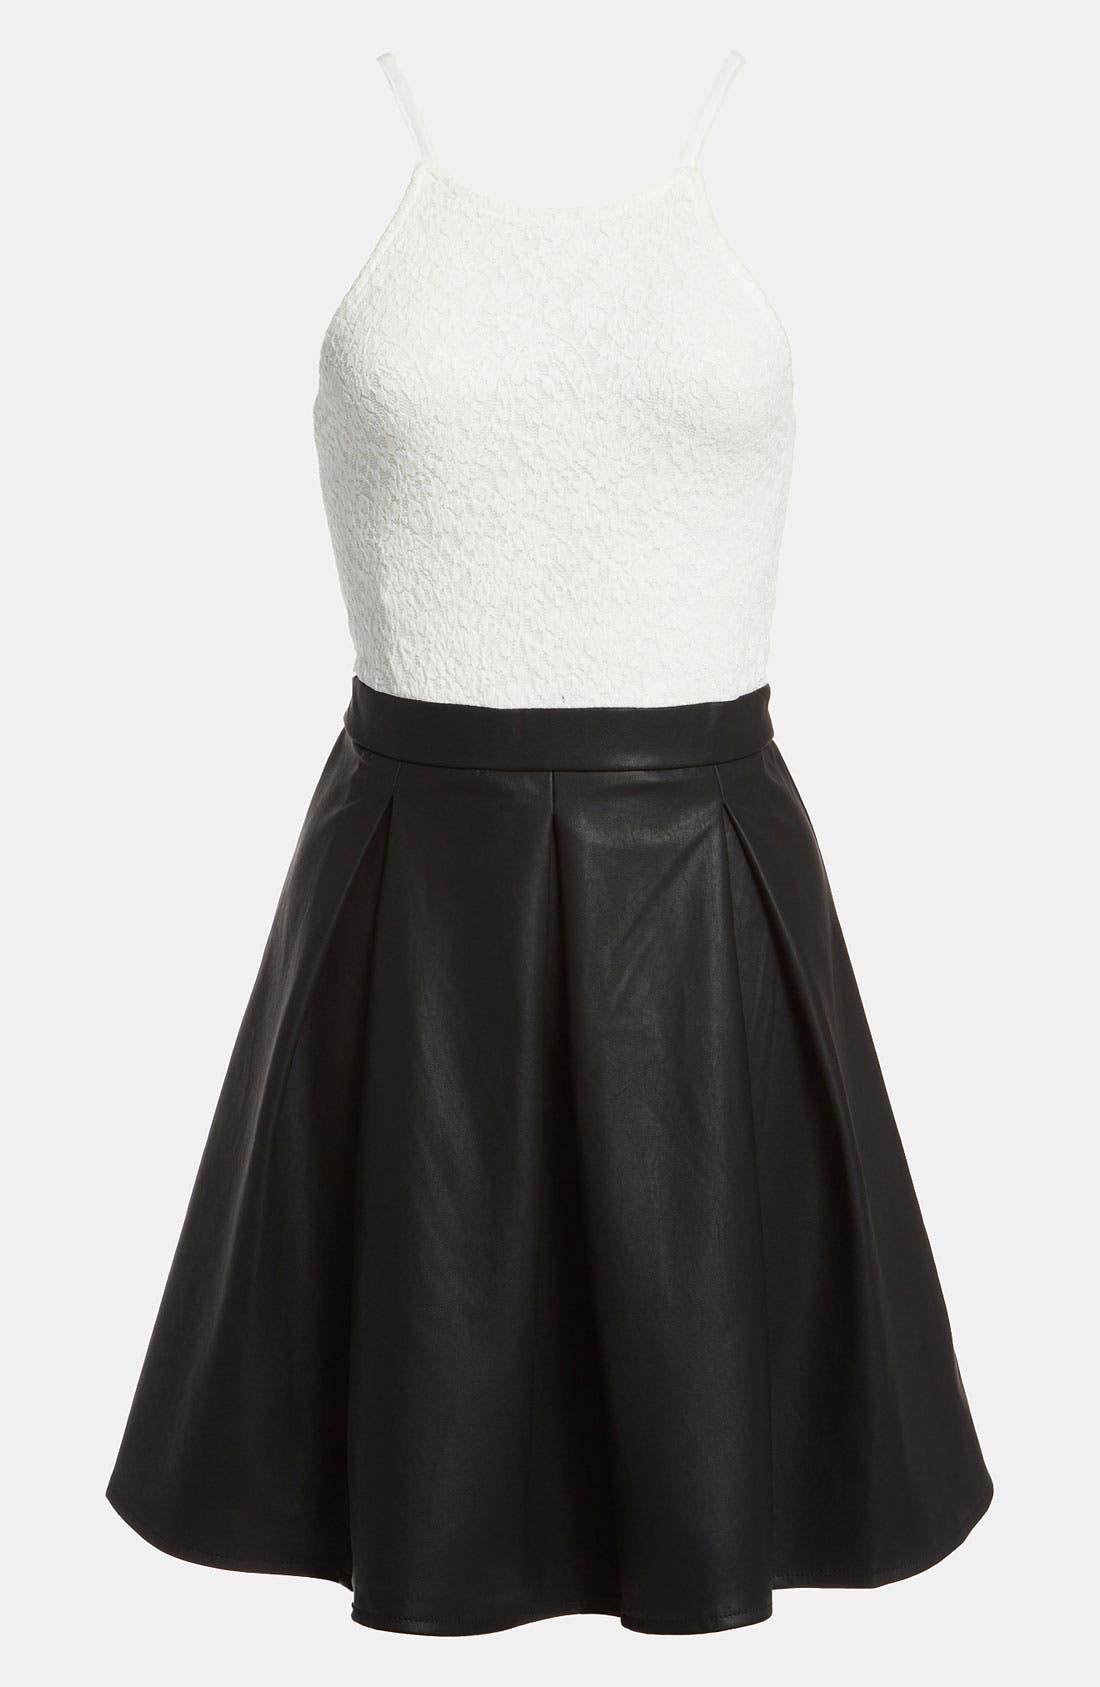 Alternate Image 1 Selected - MINKPINK 'Imogen' Combo Dress